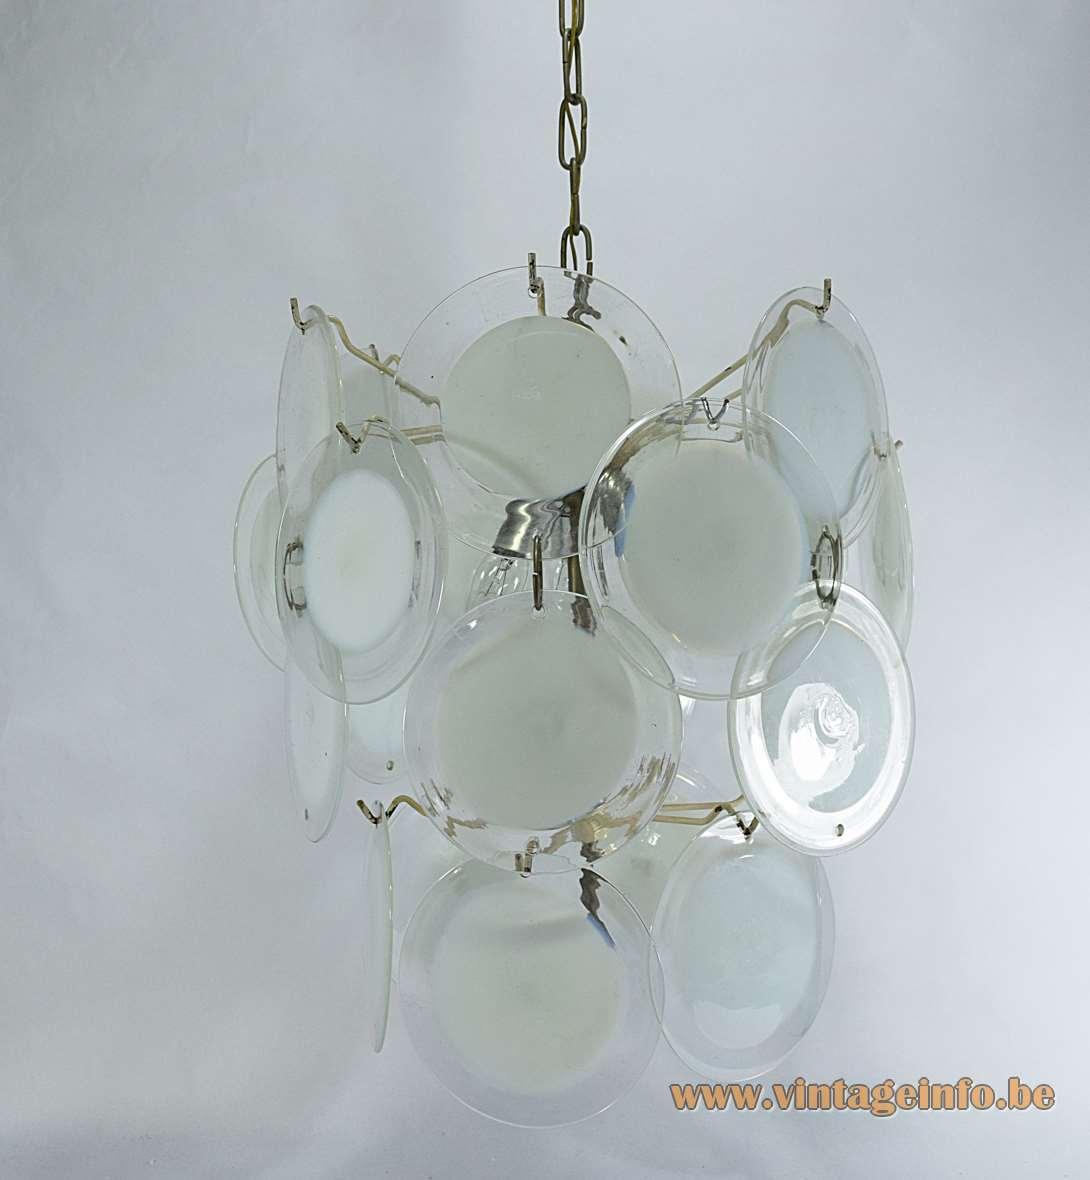 24 white discs murano chandelier 36 glass dishes chrome wire frame Mazzega Vistosi design 1960s 1970s